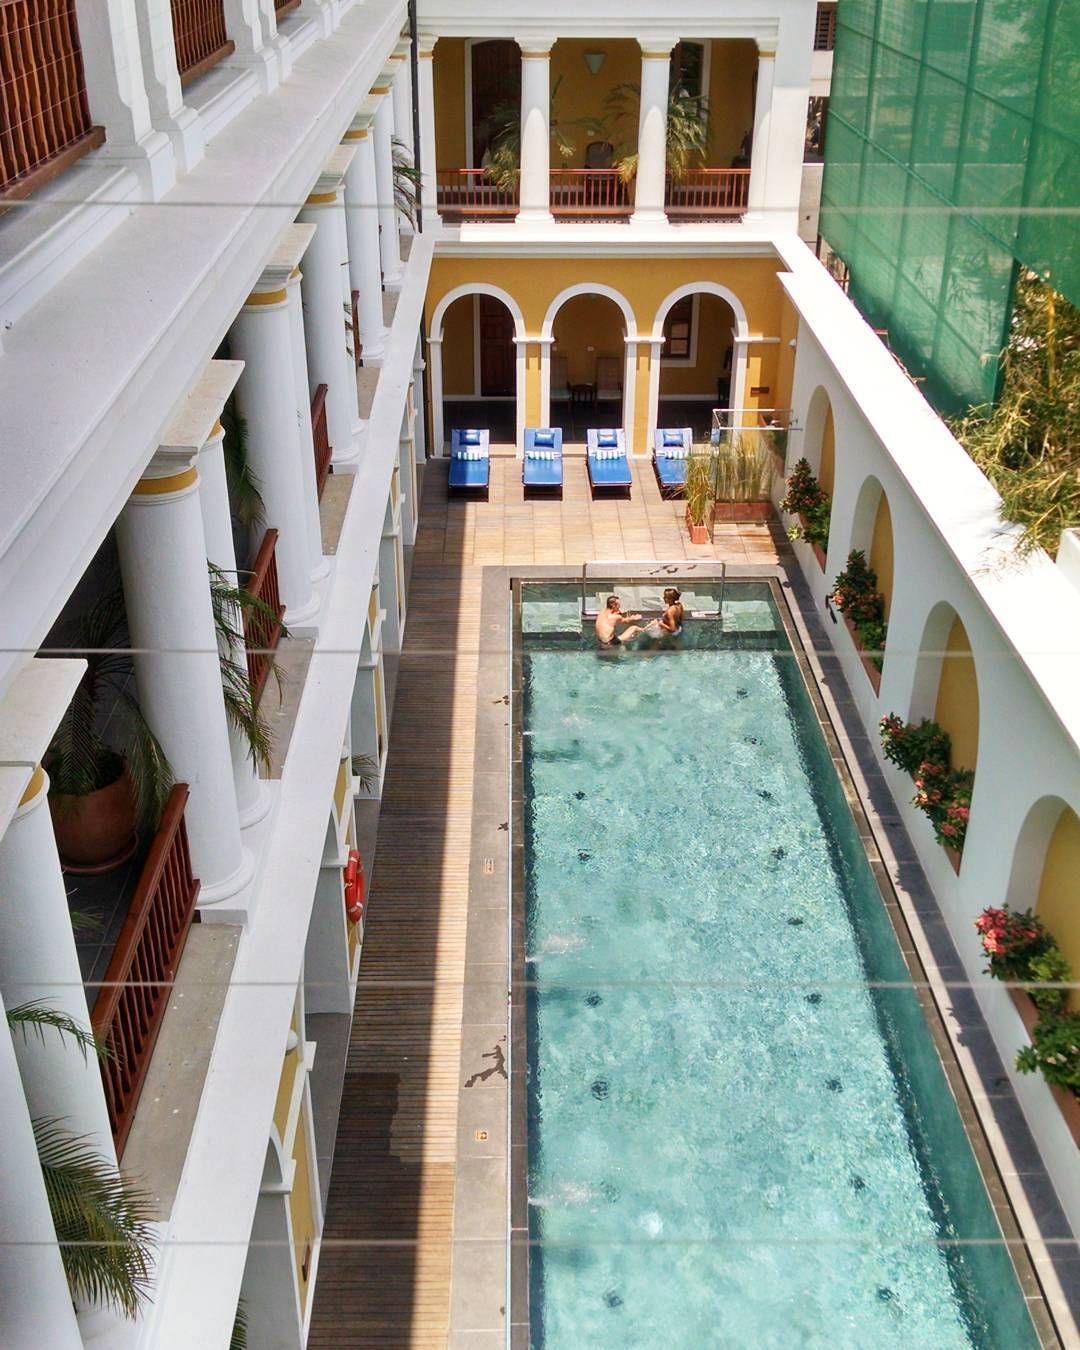 Palais De Mahé Purry Frenchquarter Hotels Pondicherry India Travel By